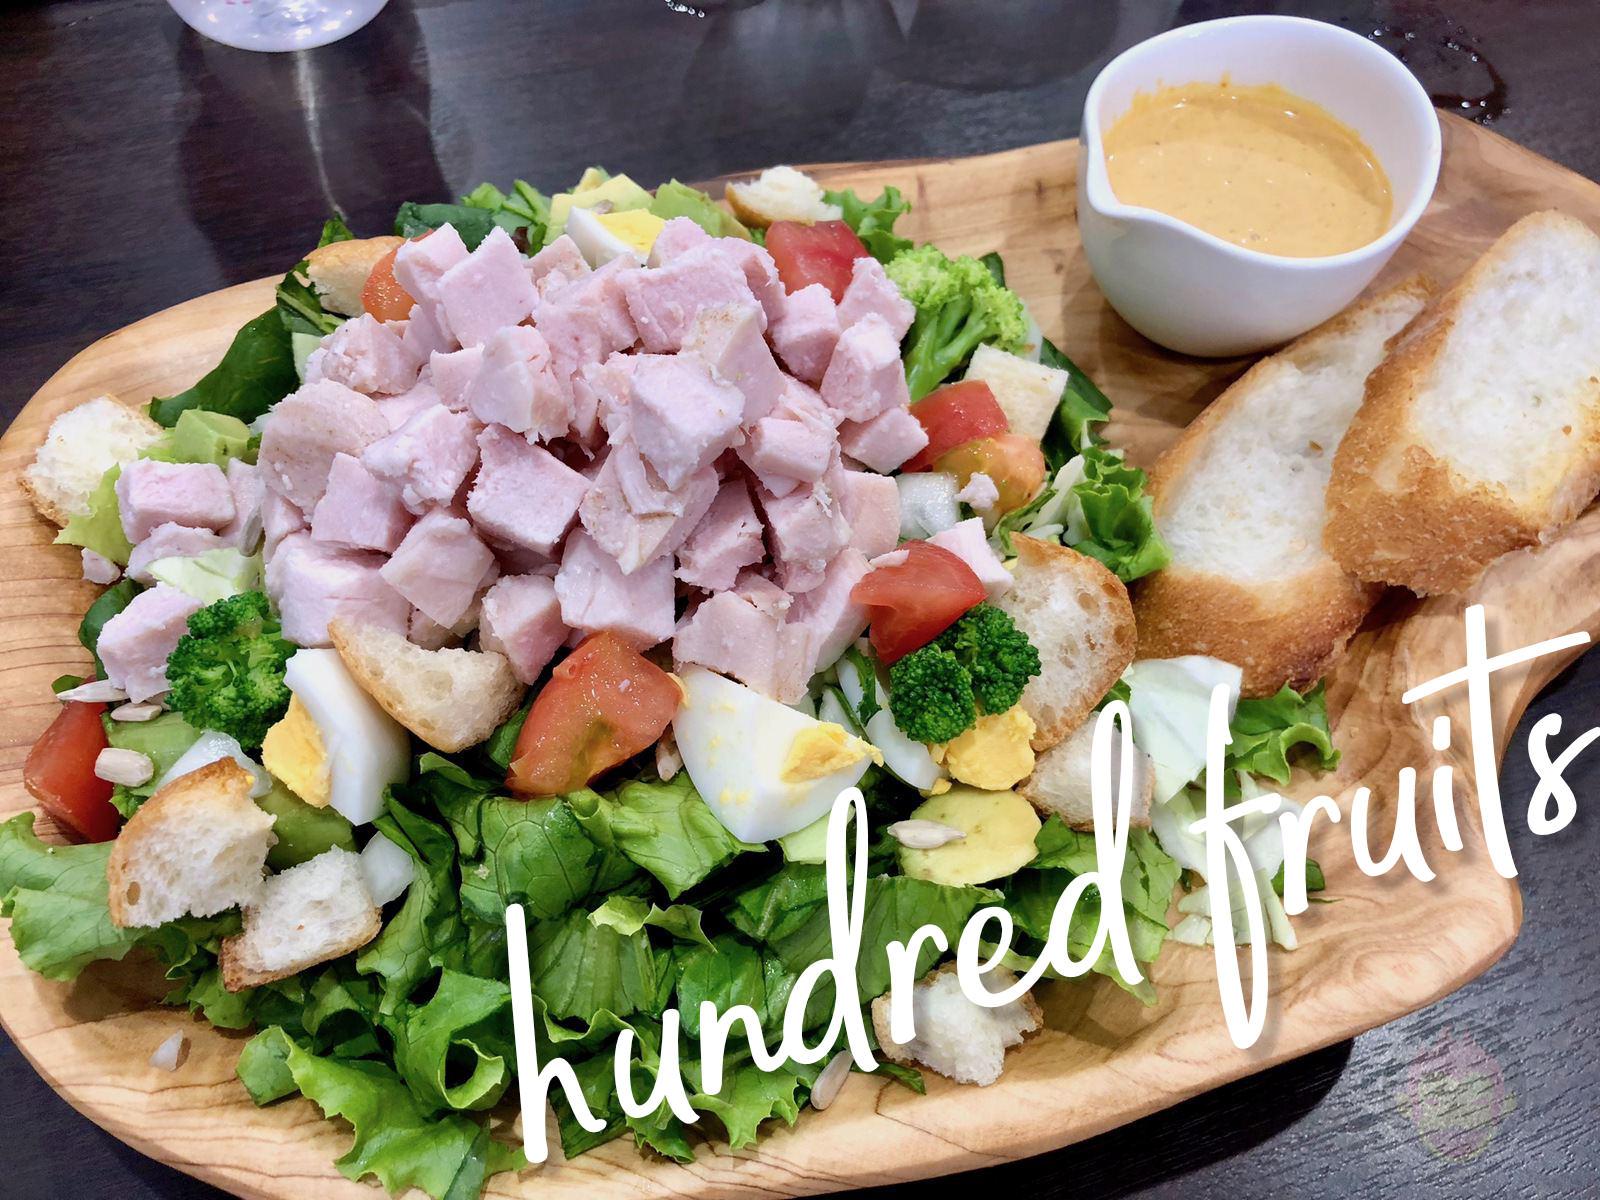 Hundred-Fruits-Salad-and-sweets.jpg